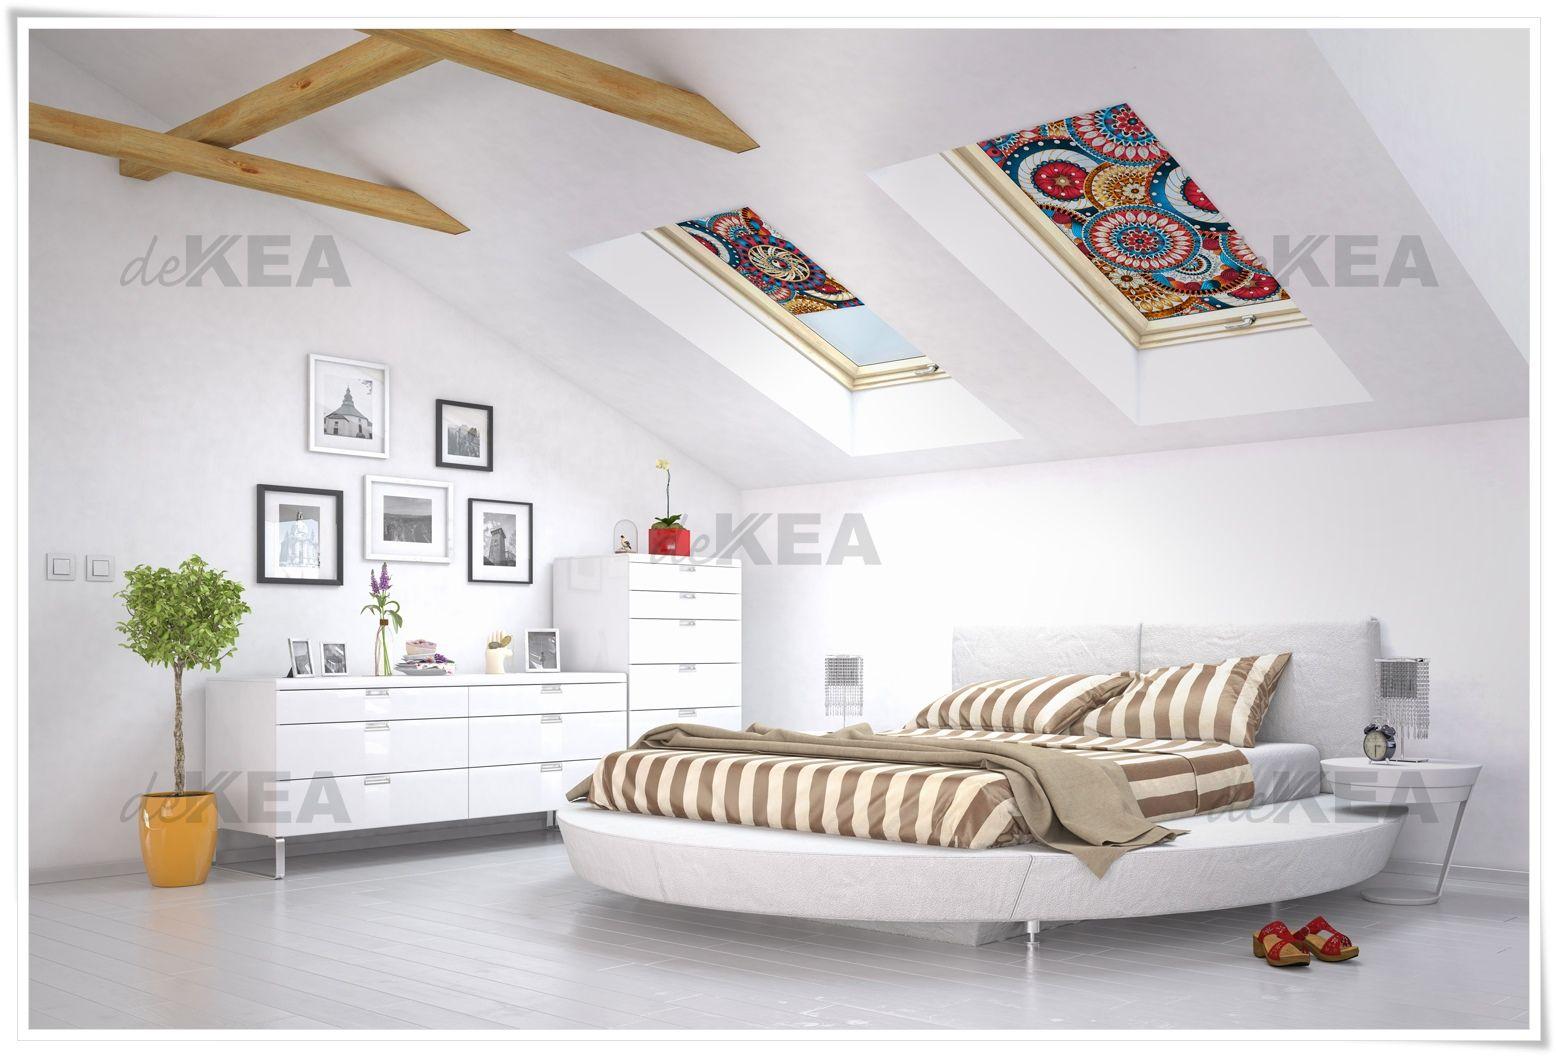 fakro design idea. Rolety Dachowe DeKEA W Stylu Retro Do Okien Fakro, Velux, Roto I Okpol Fakro Design Idea